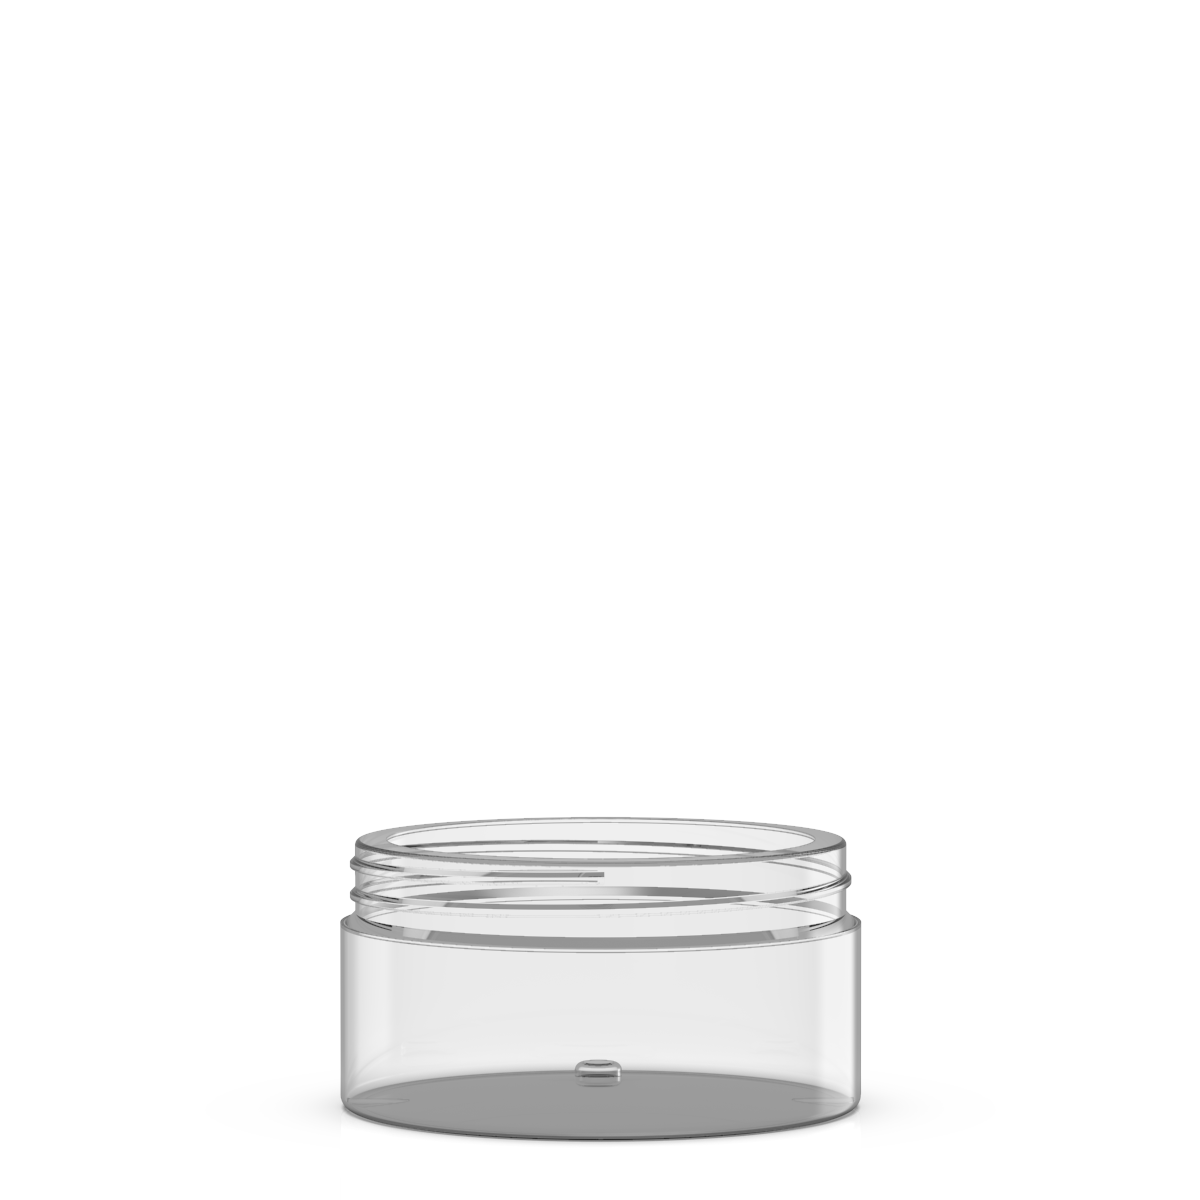 Vaso cilindrico 250 ml PETG, collo ø100, linea MANHATTAN